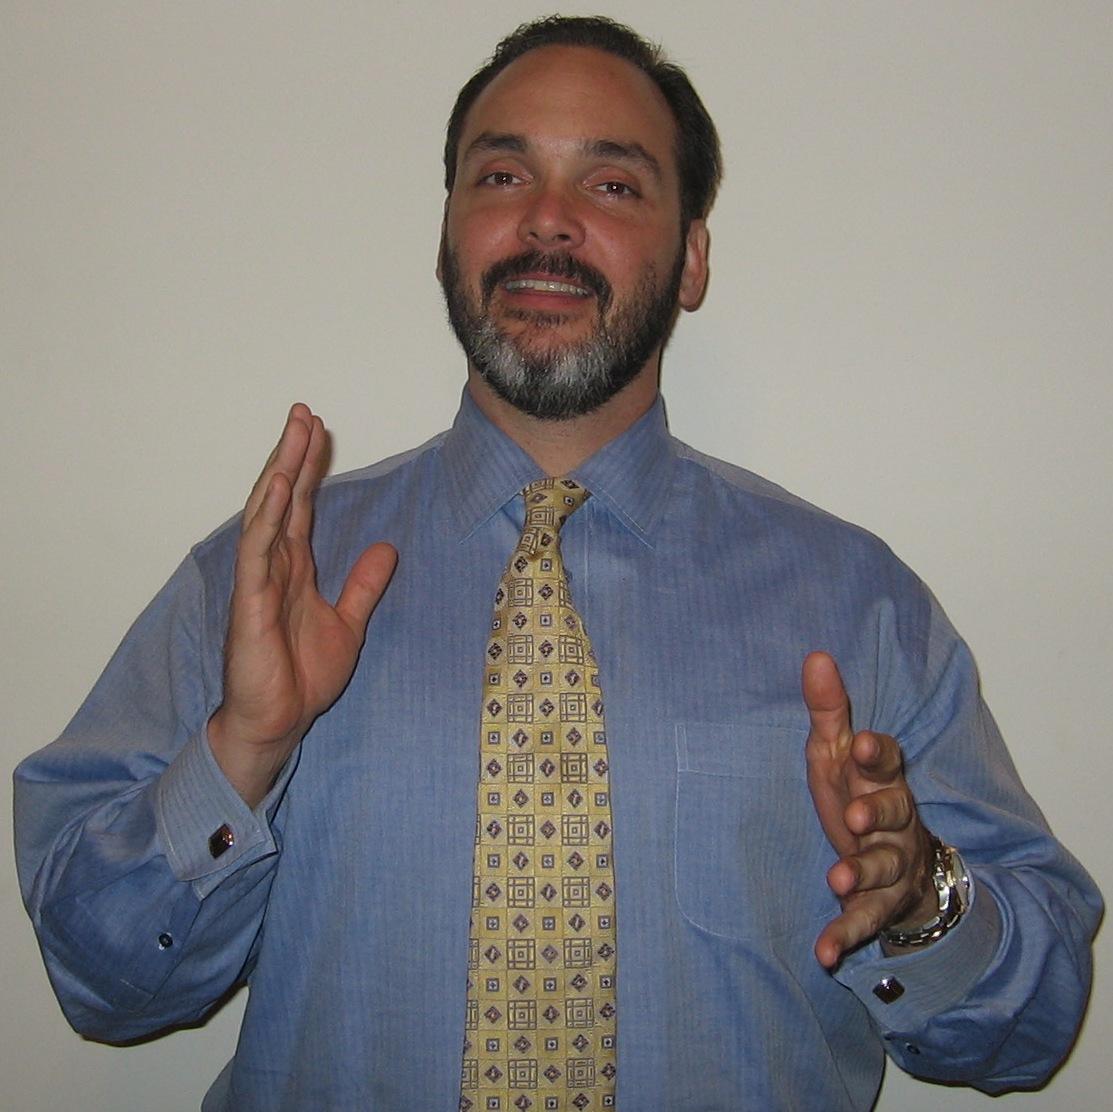 Damon Ladd-Thomas On WBCX-89.1FM, Tuesday, November 16, 9:00 A.M.